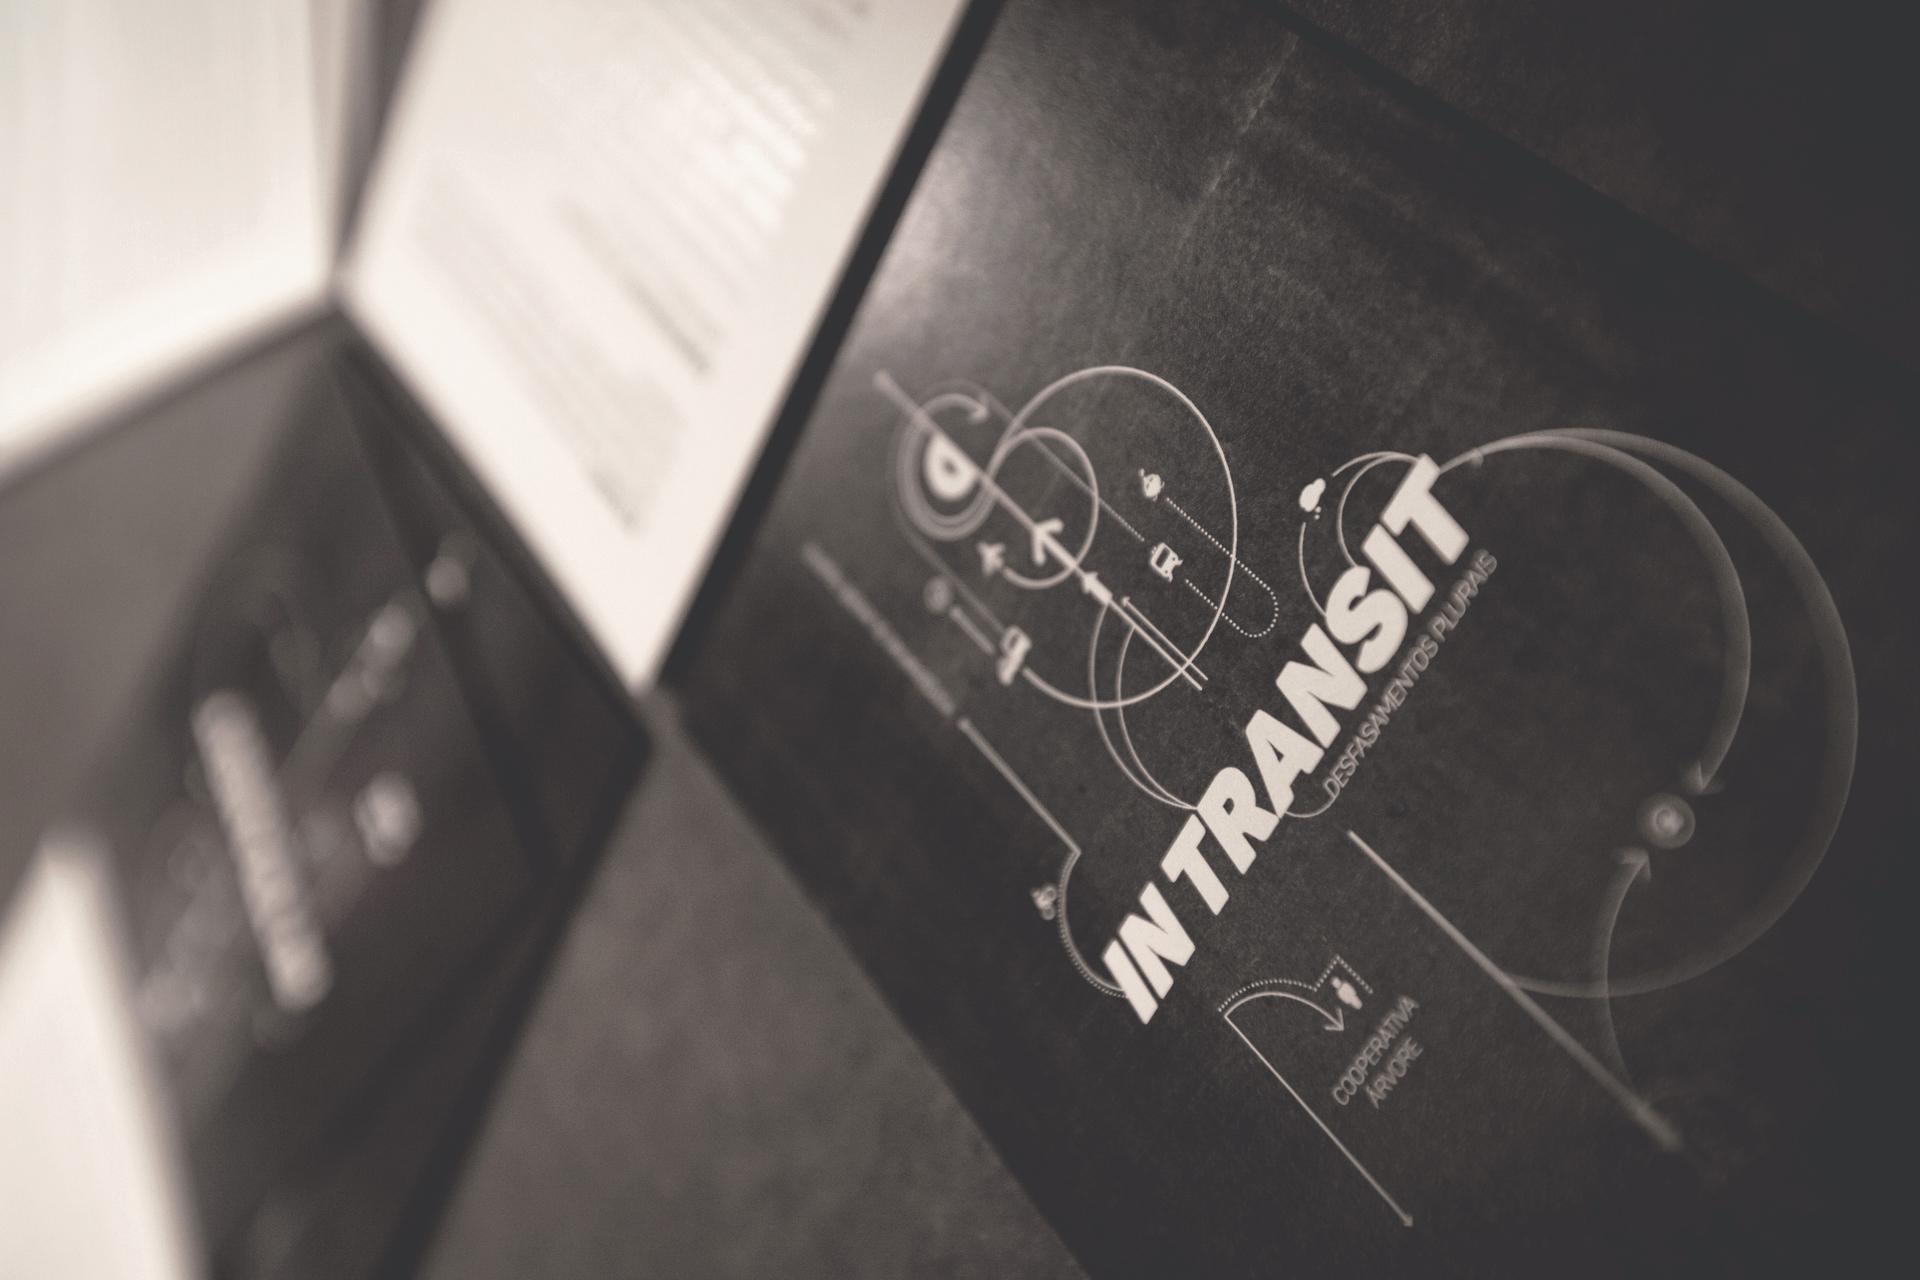 In+Transit+bonjourmolotov+André+Gigante+Experimenta+Design+2015+EXD15+Photography+Exhibition+Exposição+Fotografia+Cooperativa+Árvore+18C N3B.jpg